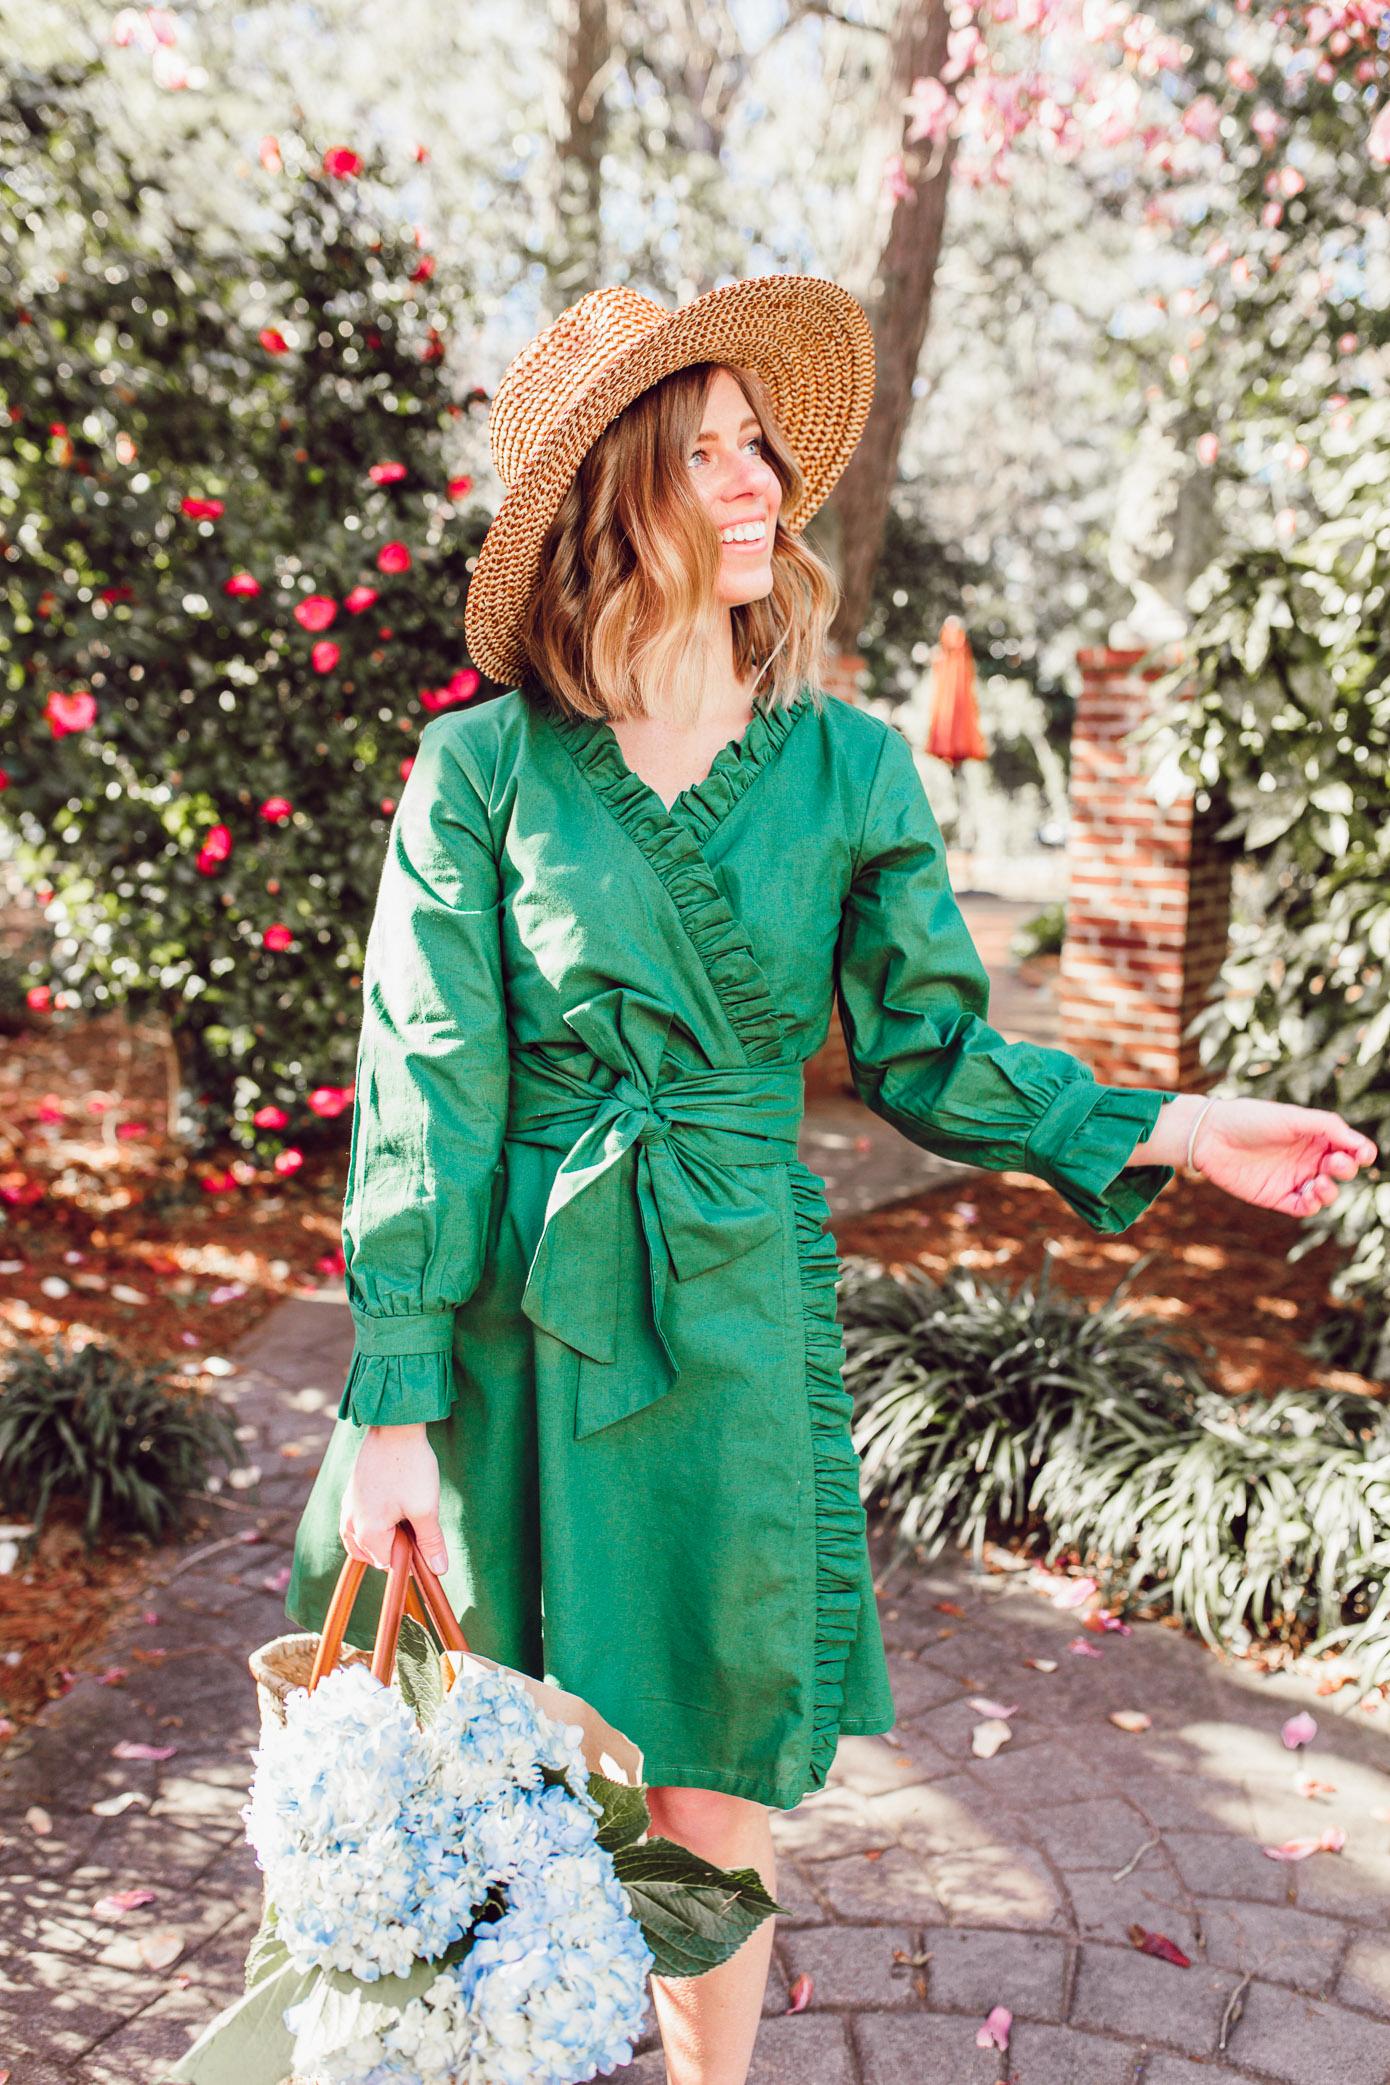 Laura Leigh Elliott shares her favorite Green Spring Dresses | Louella Reese